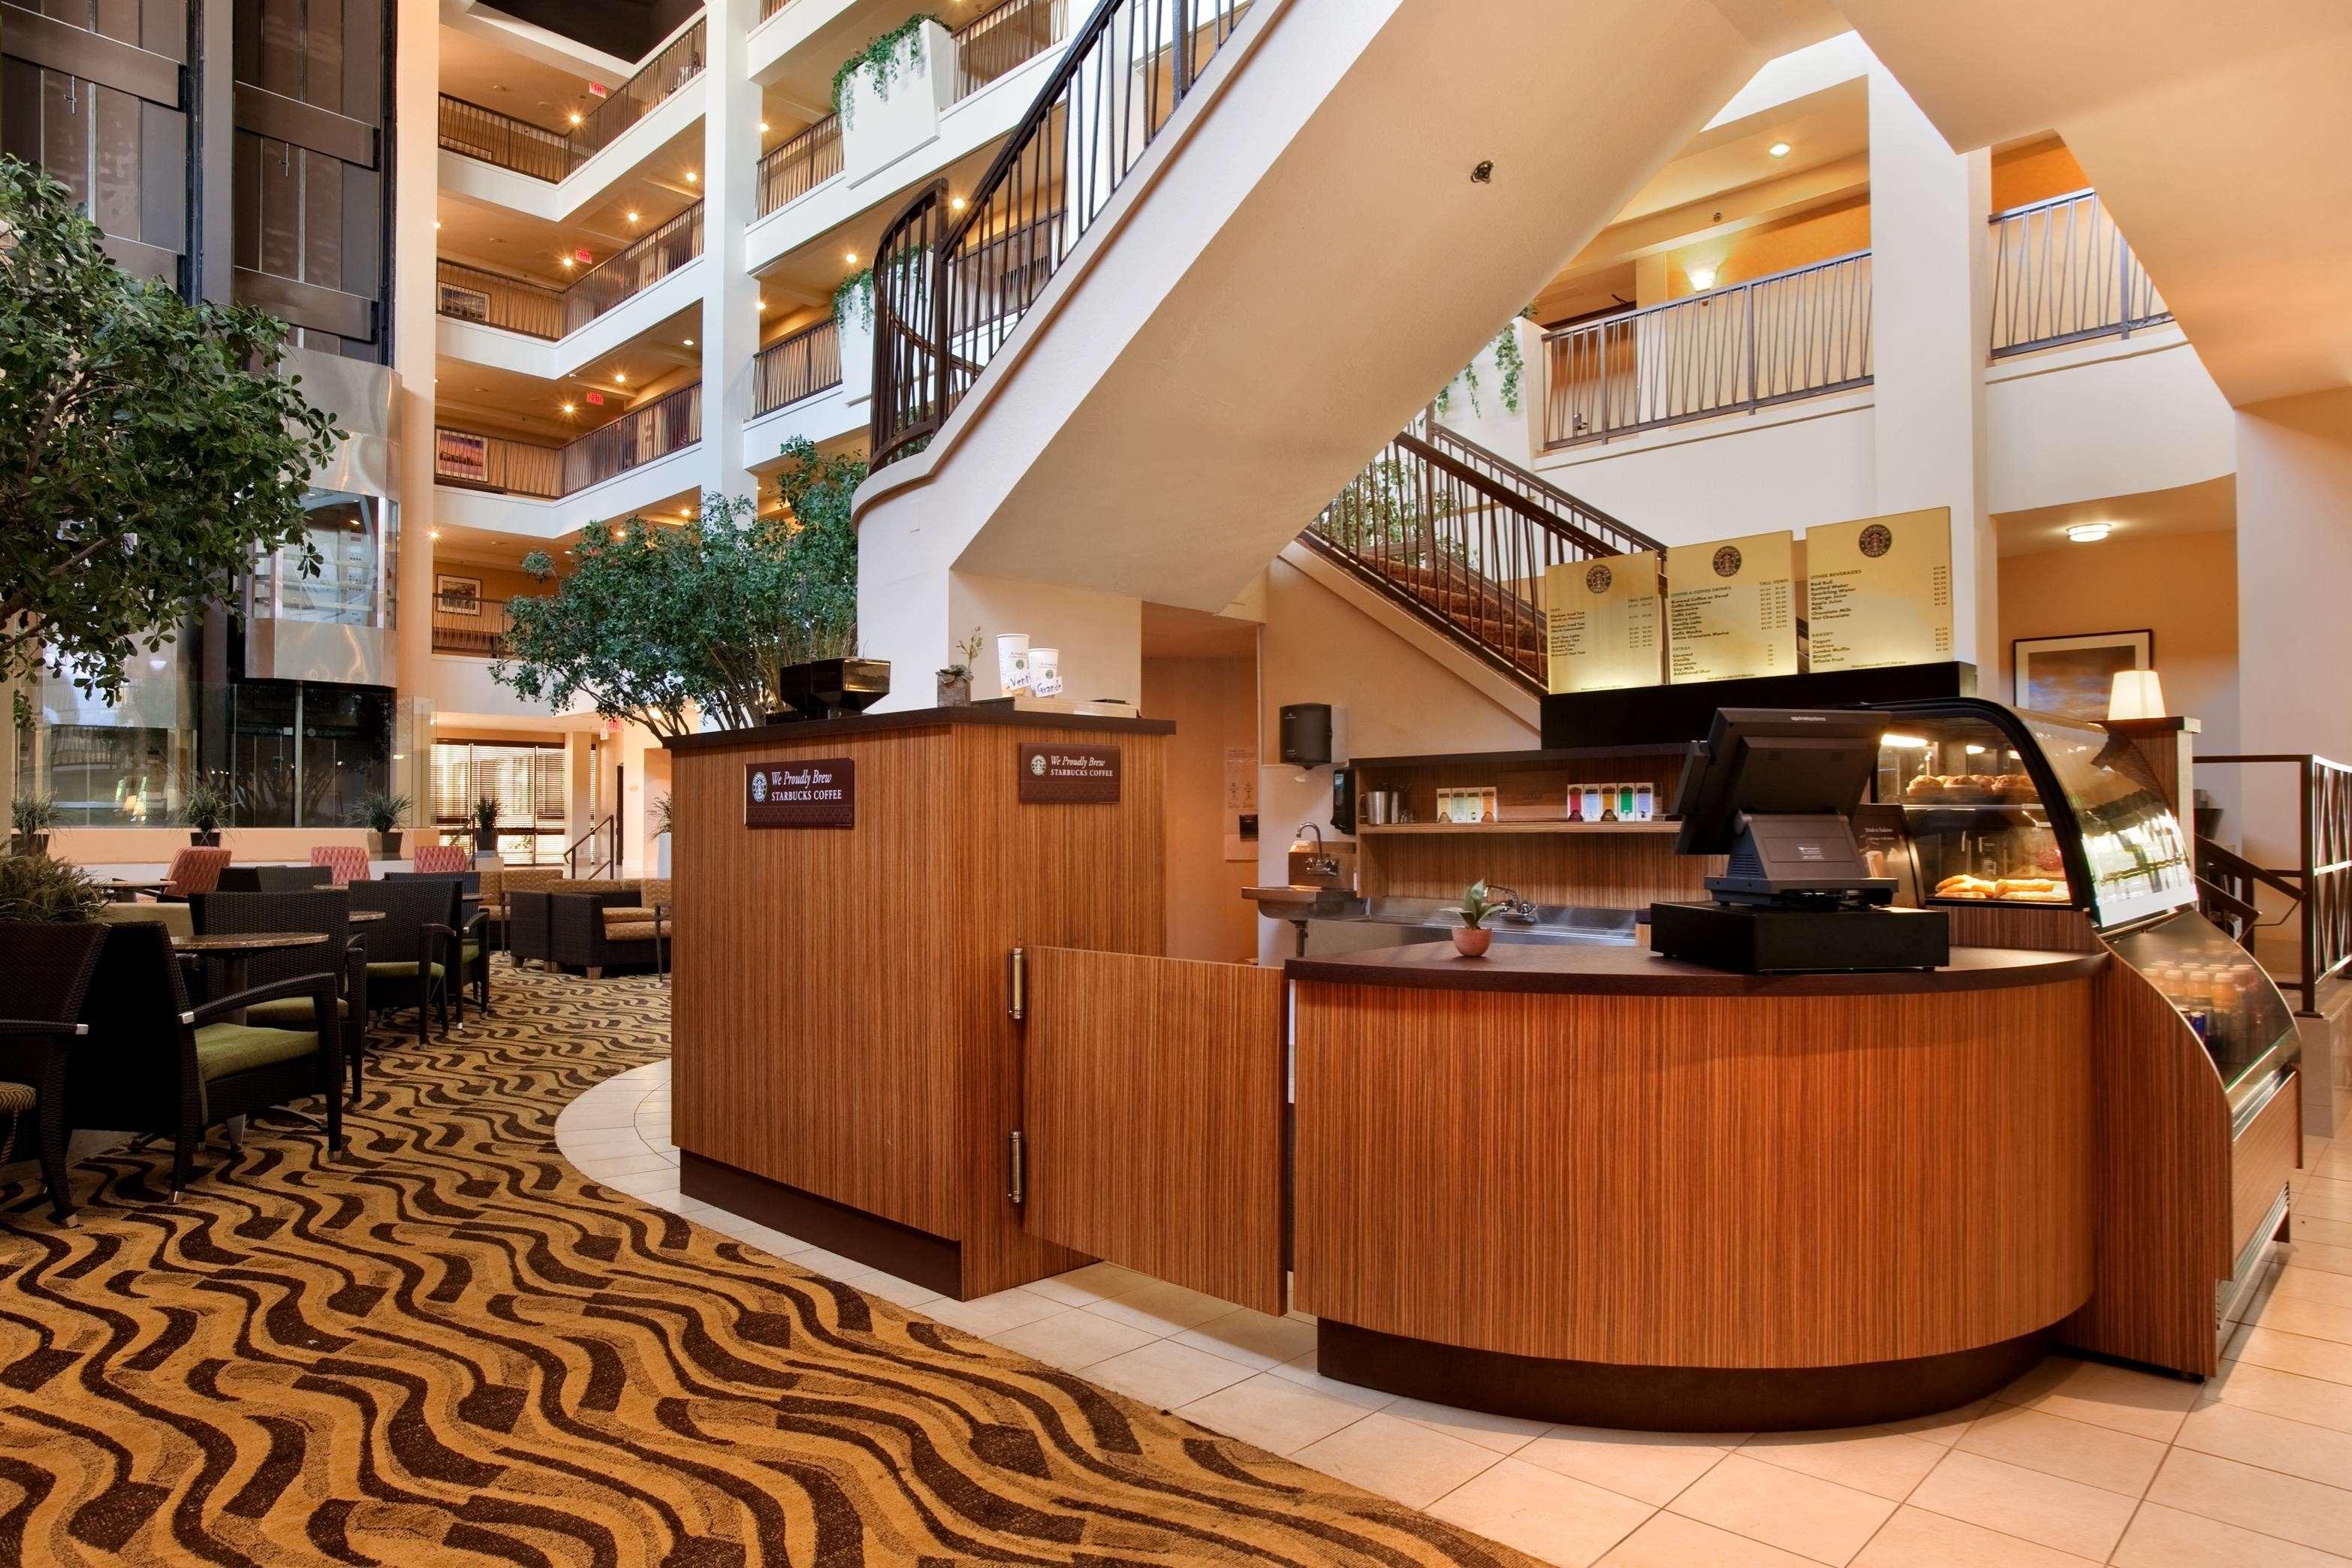 Hilton Stockton image 5